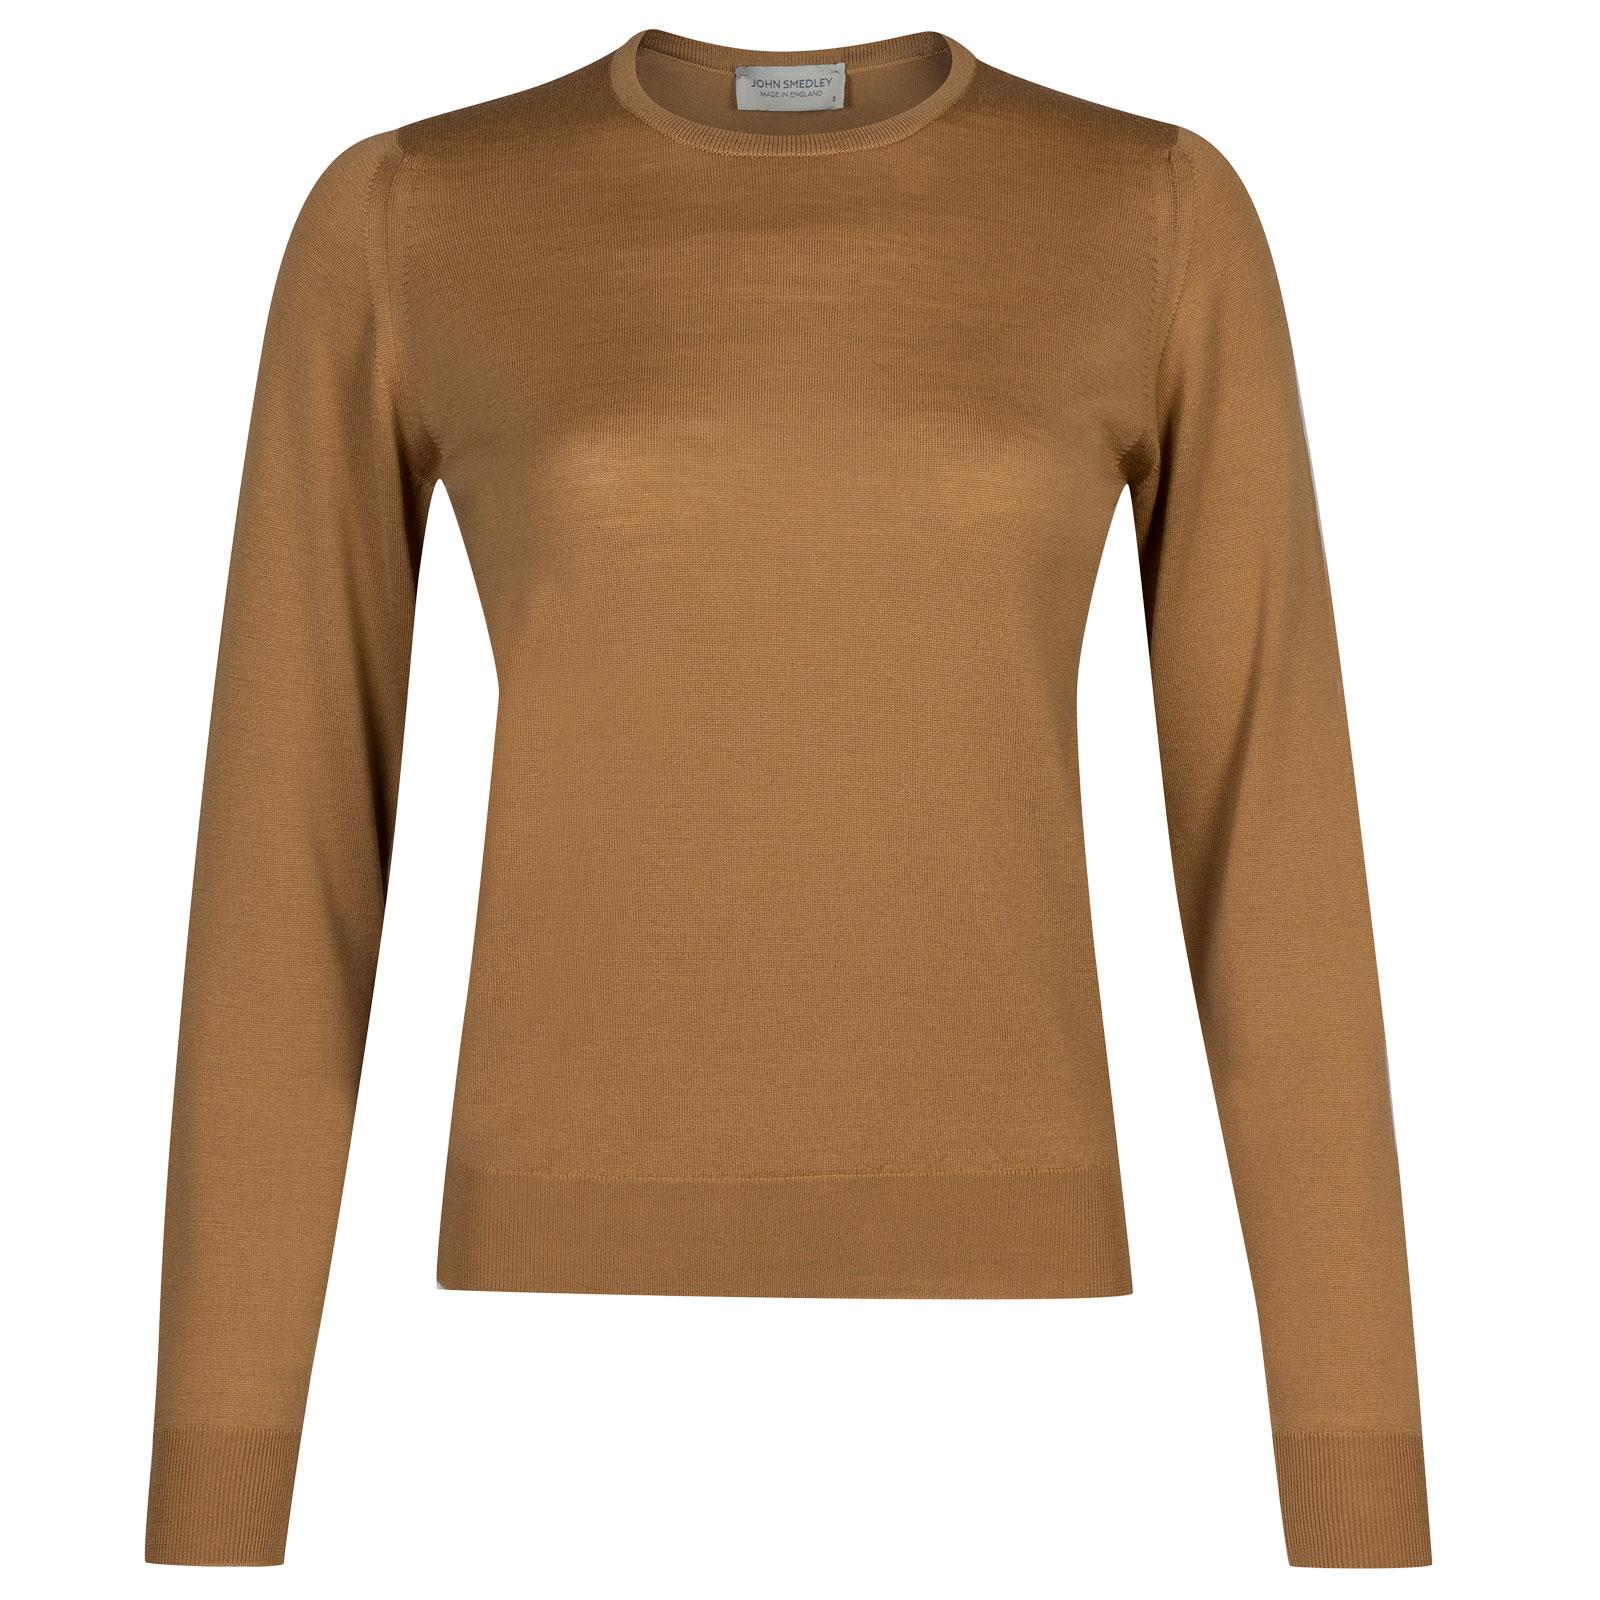 John Smedley venice Merino Wool Sweater in Camel-S